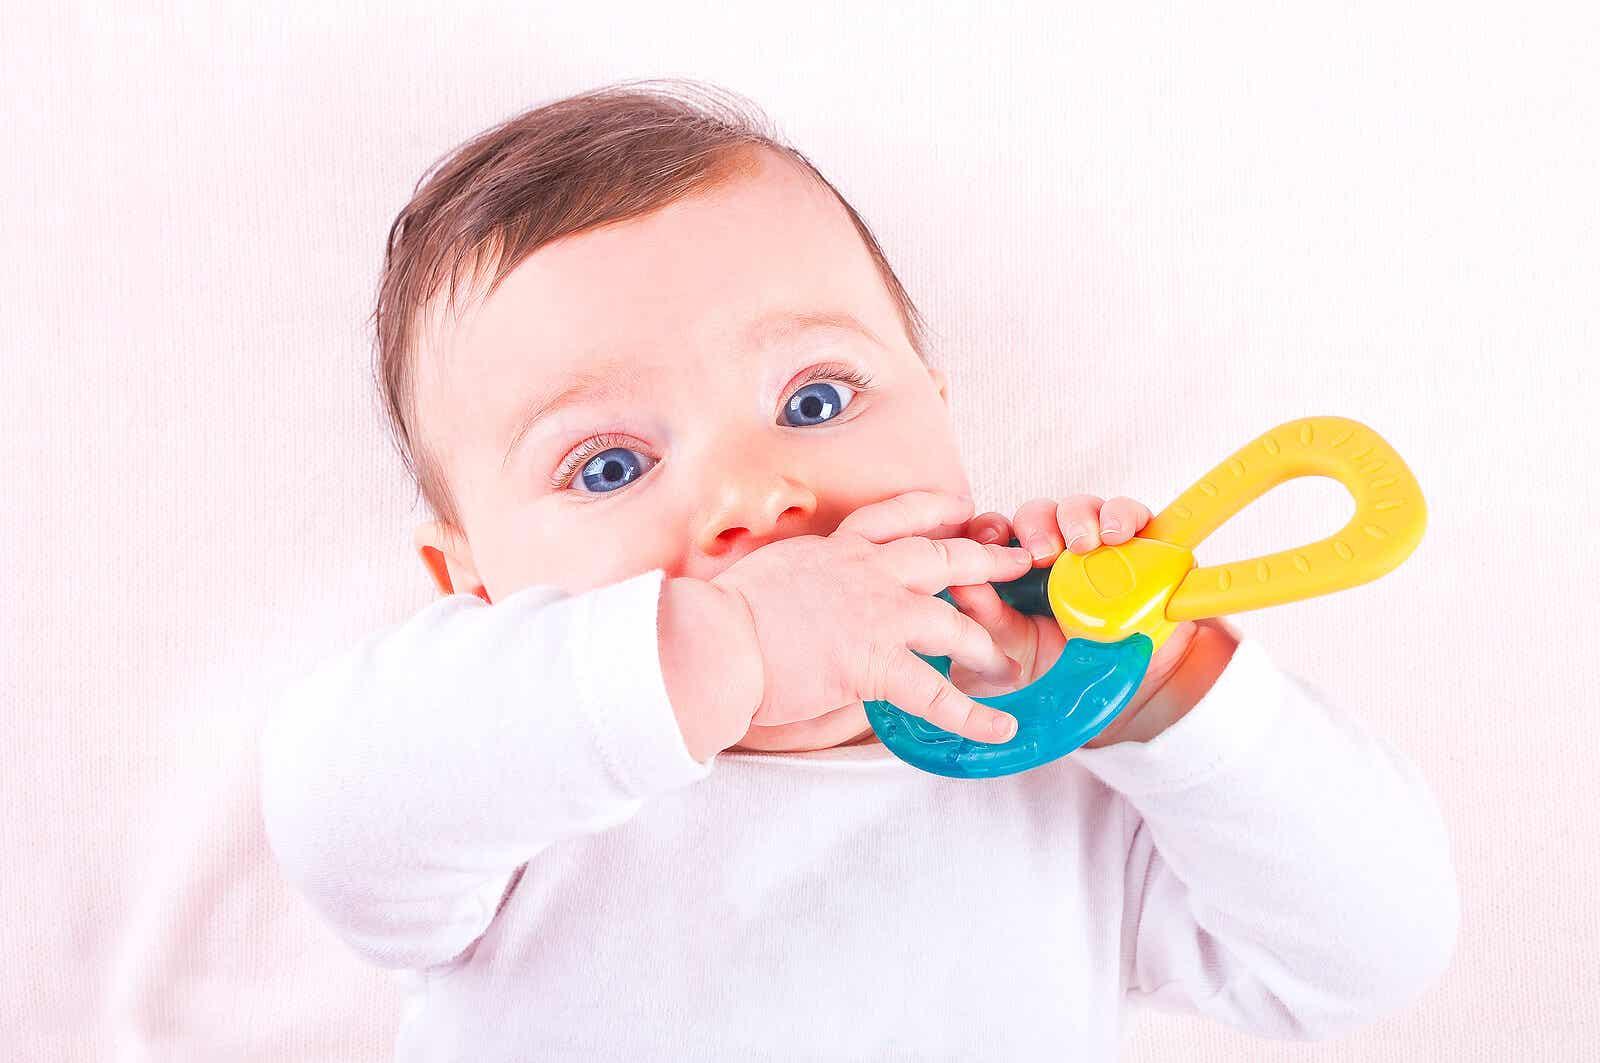 Baby teething.